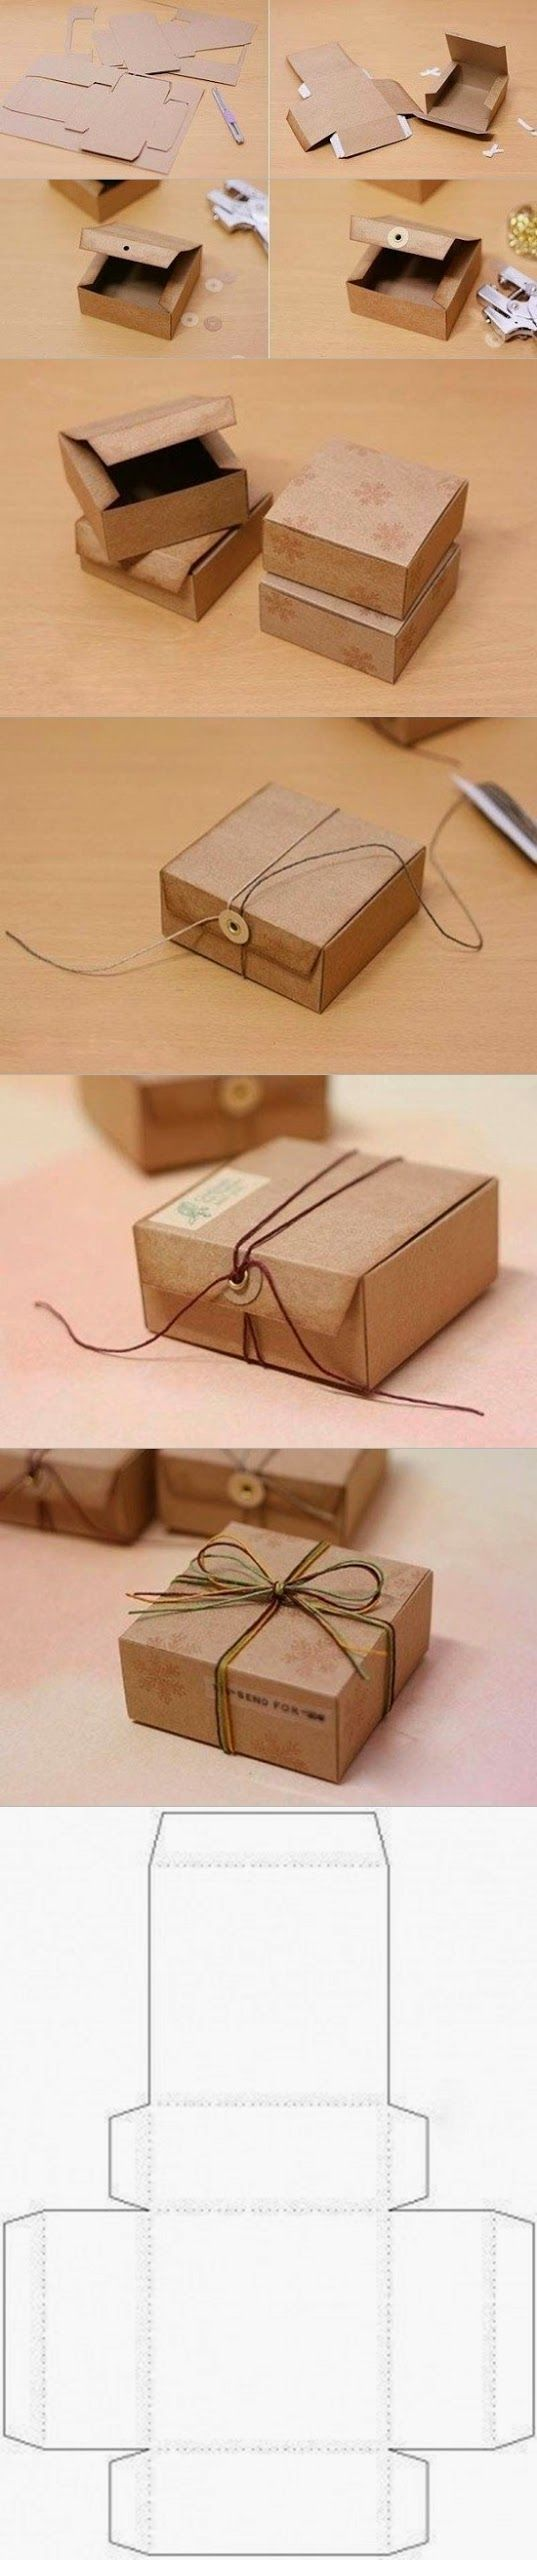 http://diy-craft.blogspot.mx/2014/03/diy-gift-box-from-cardboard.html